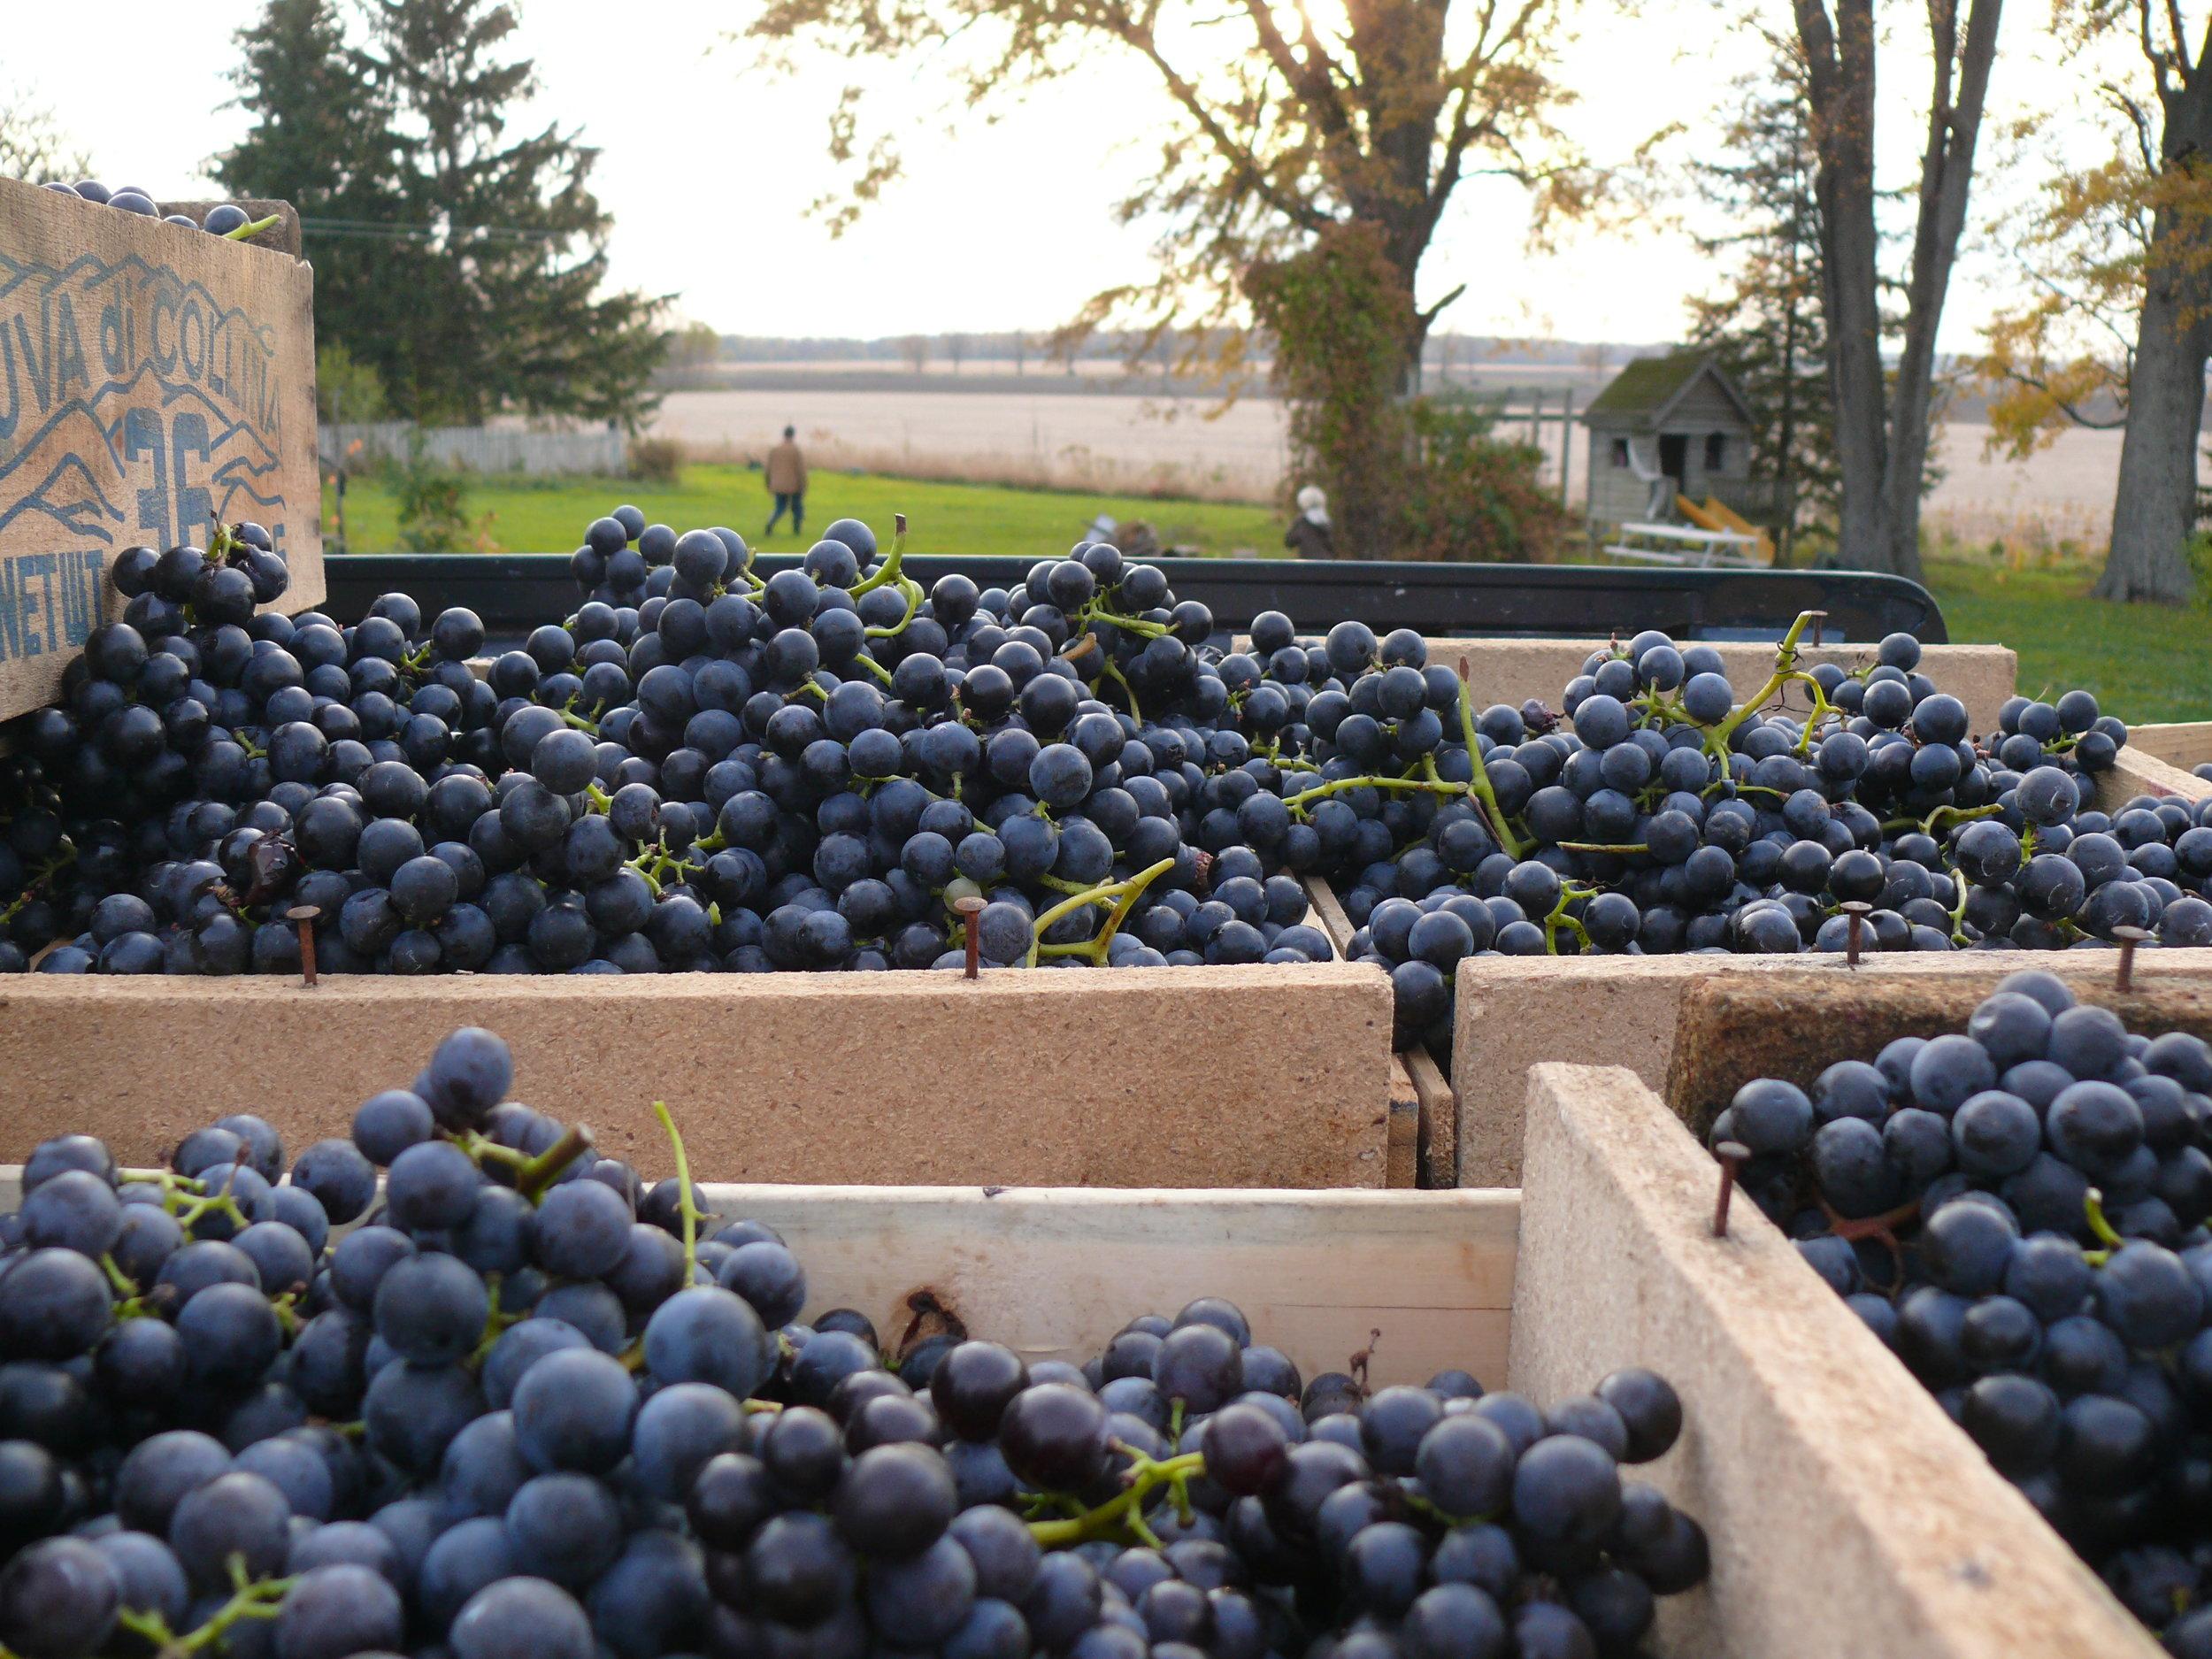 2017-04-20 Alton Estate Winery.jpg